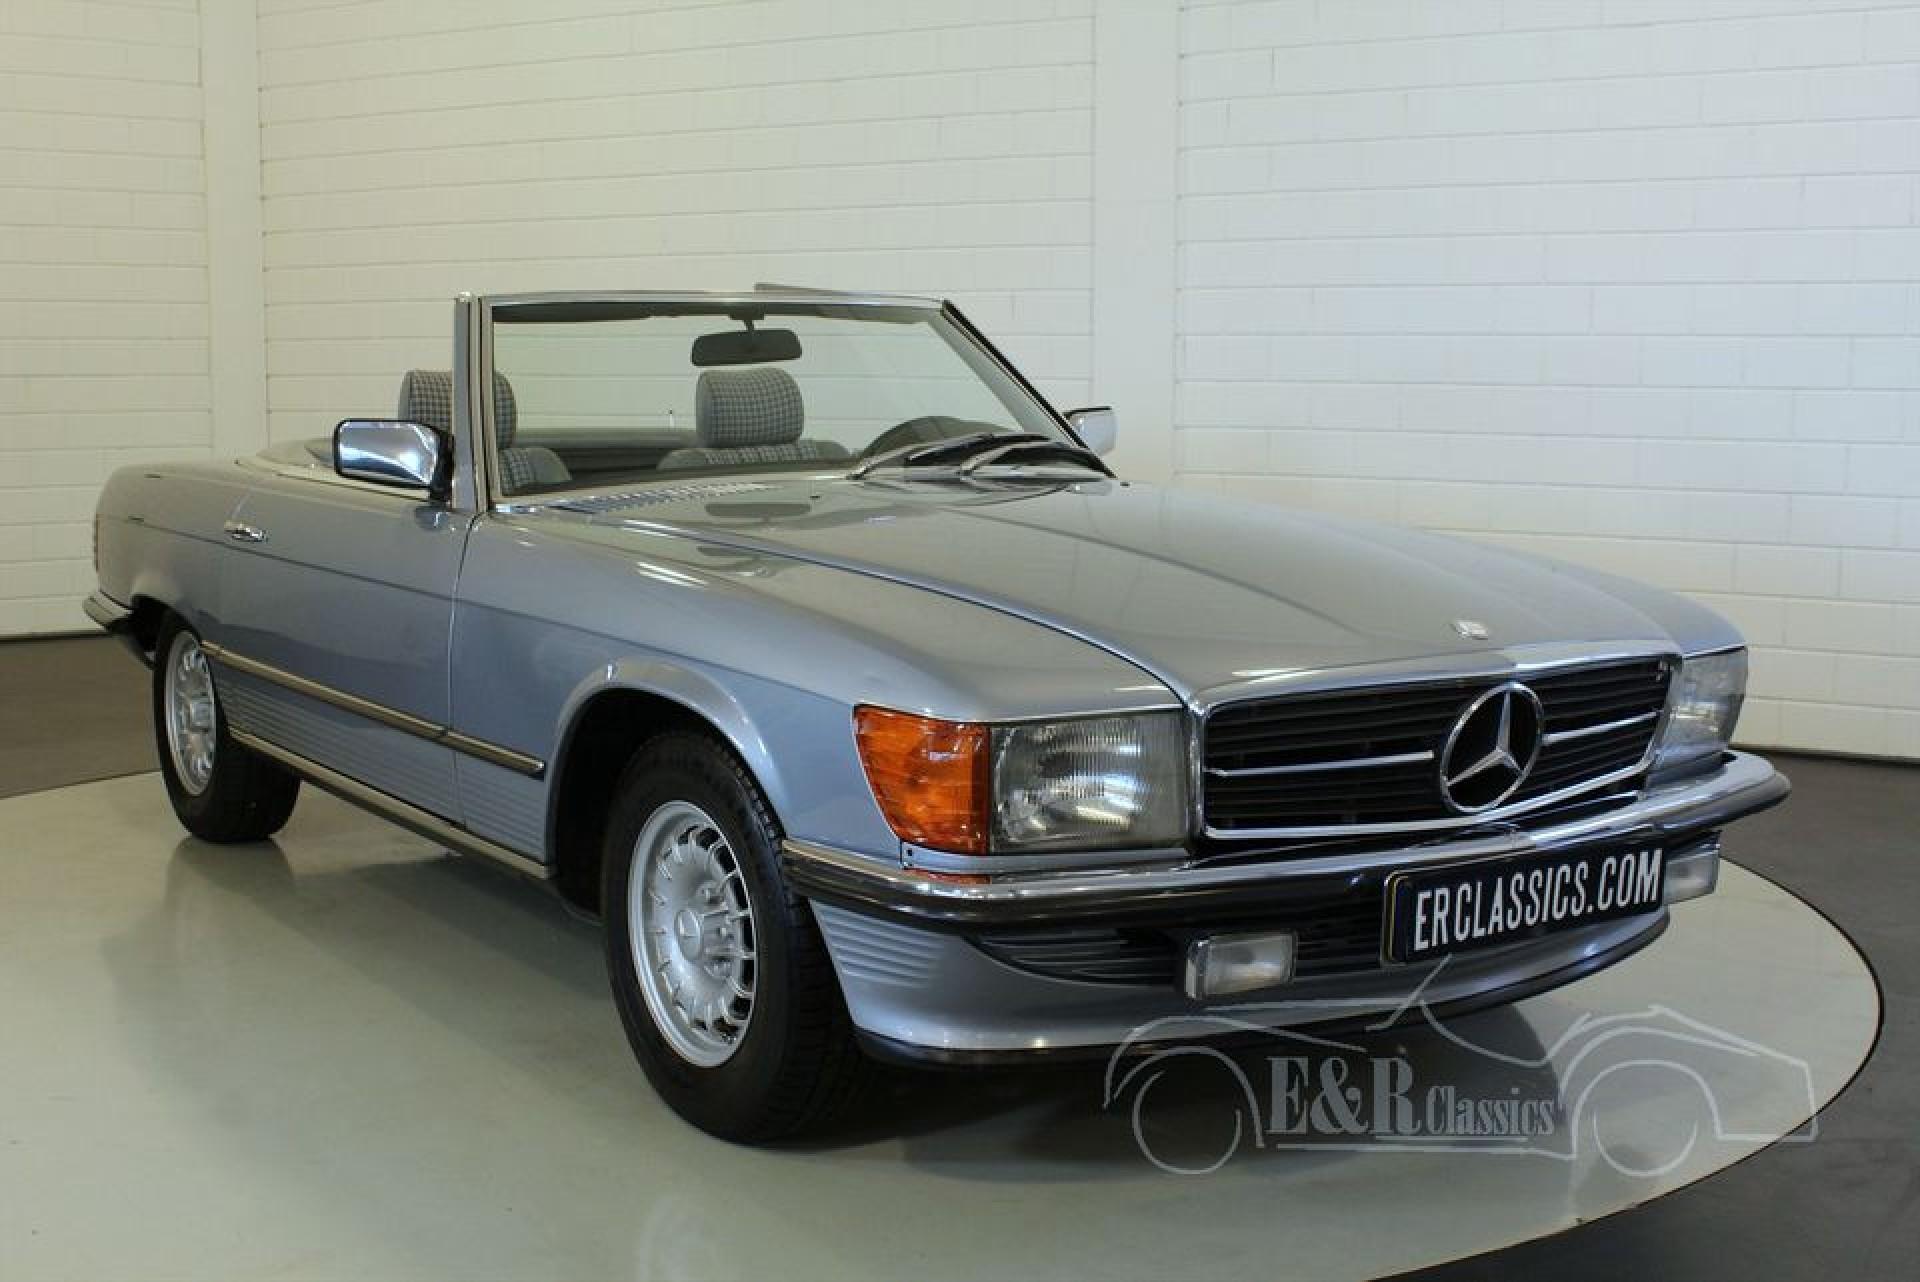 Mercedes benz 280sl cabriolet 1983 for sale at erclassics for Mercedes benz stock